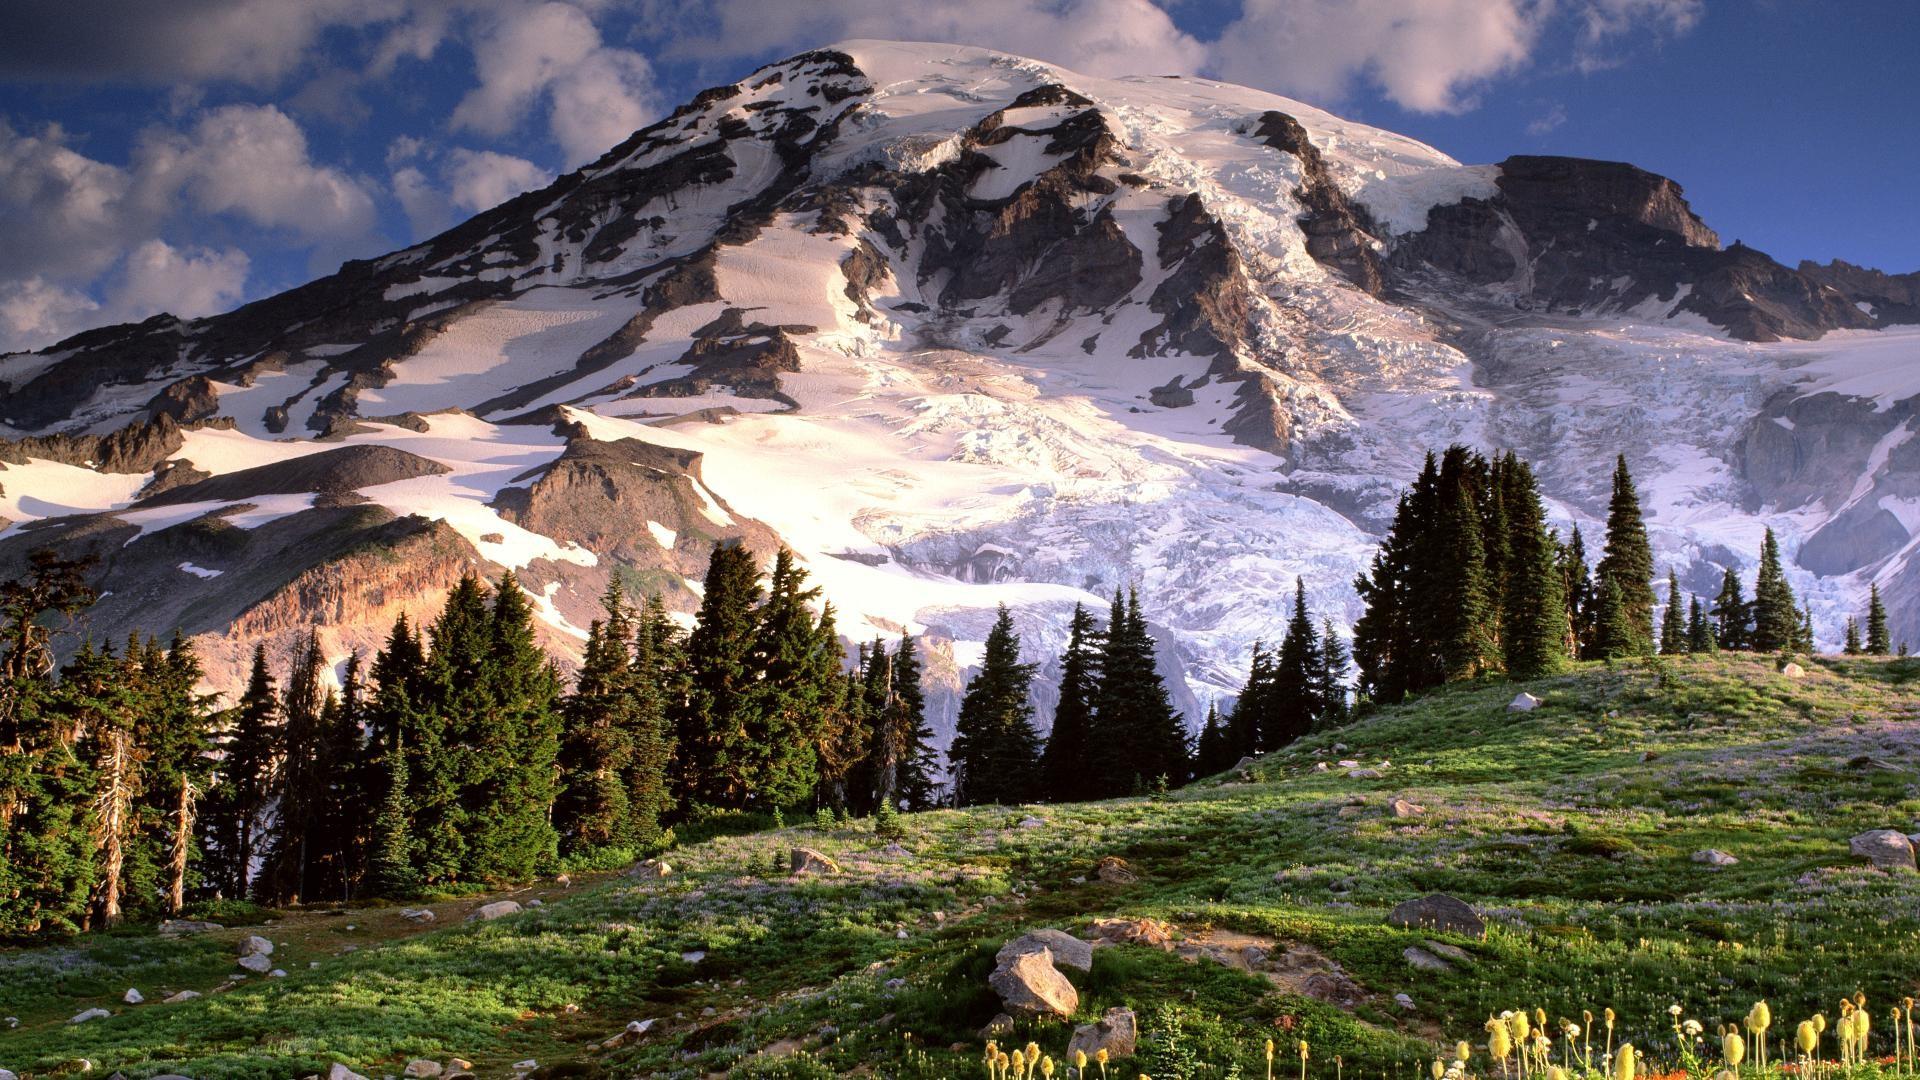 Blooming Wildflowers and Mount Rainier, Washington. Free Desktop Wallpaper  …